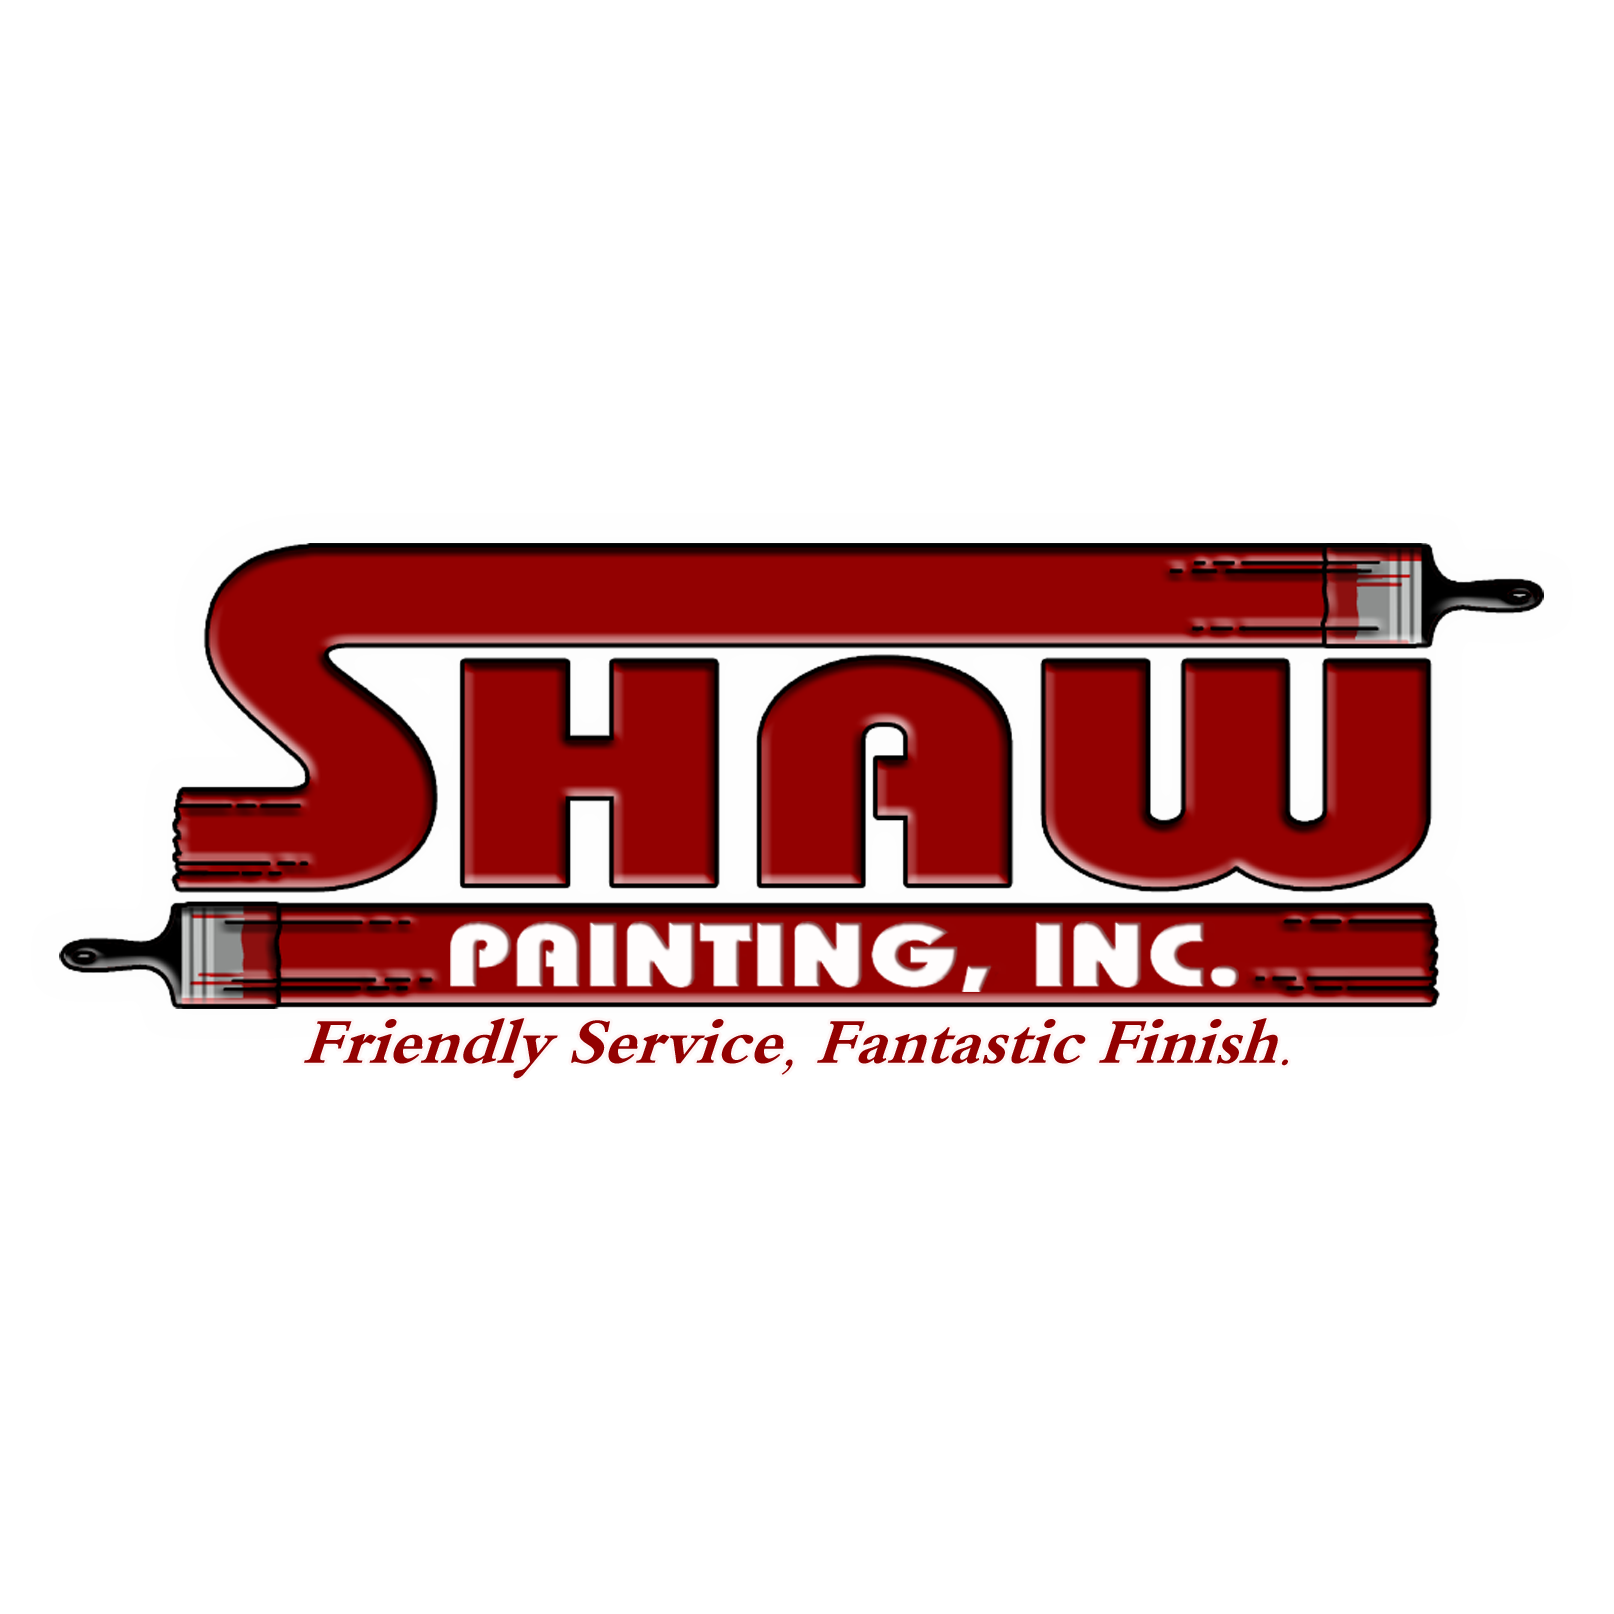 Shaw Painting Inc image 0